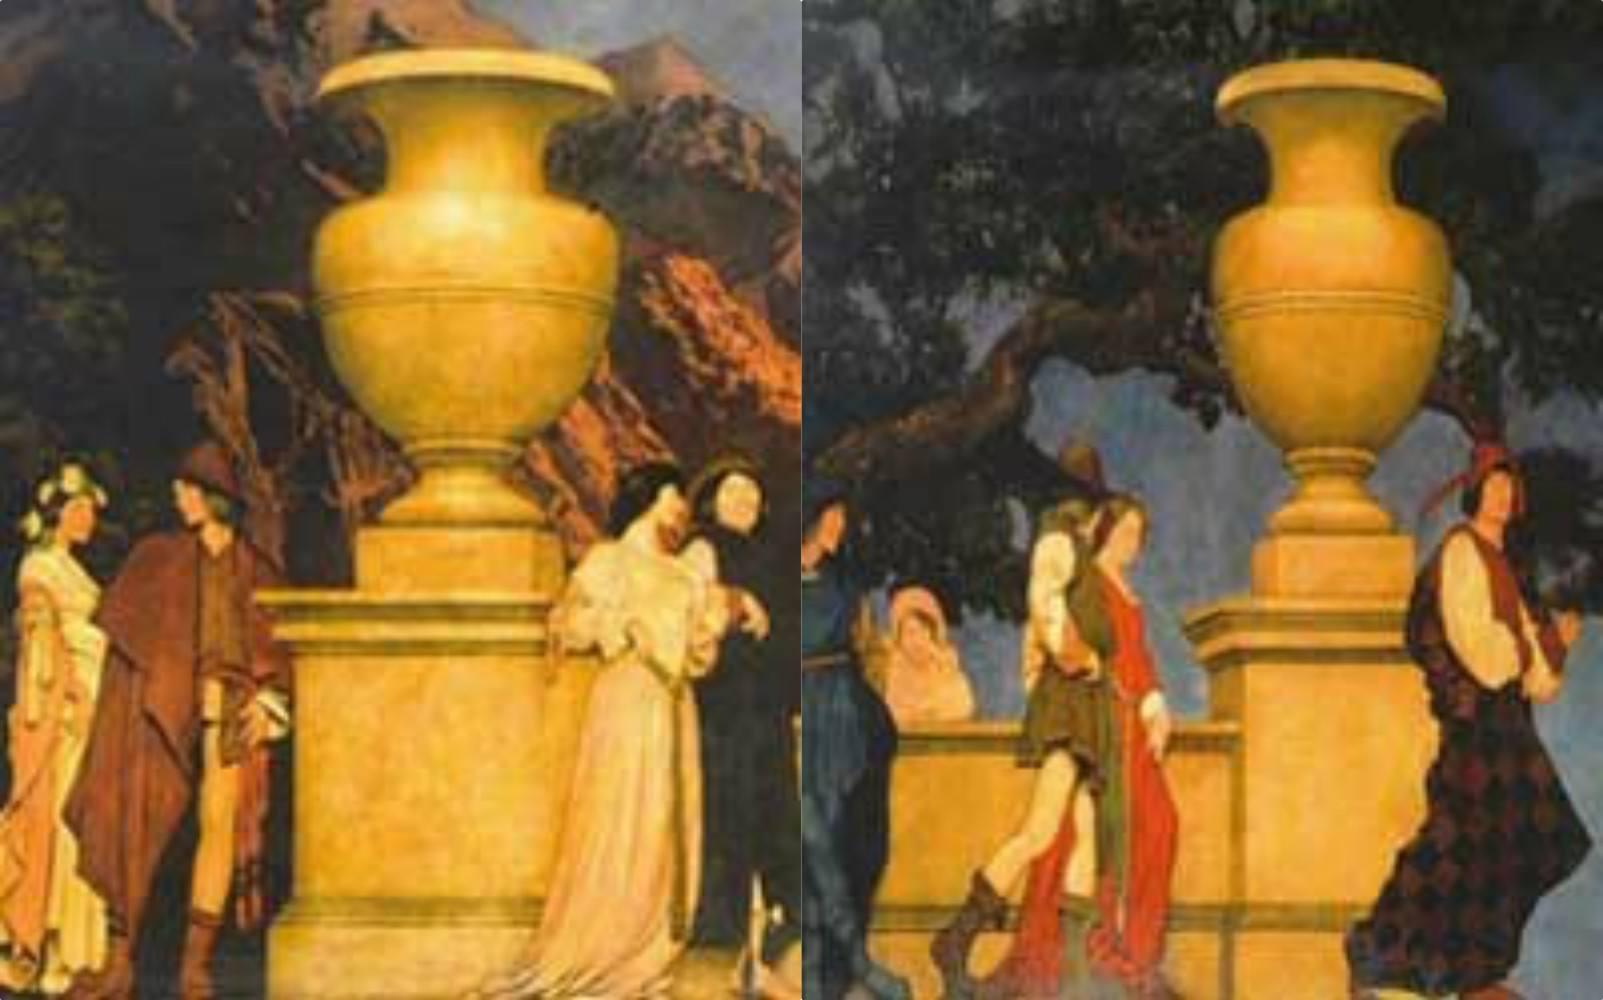 Gertrude Vanderbilt Maxfield Parrish murals-theft